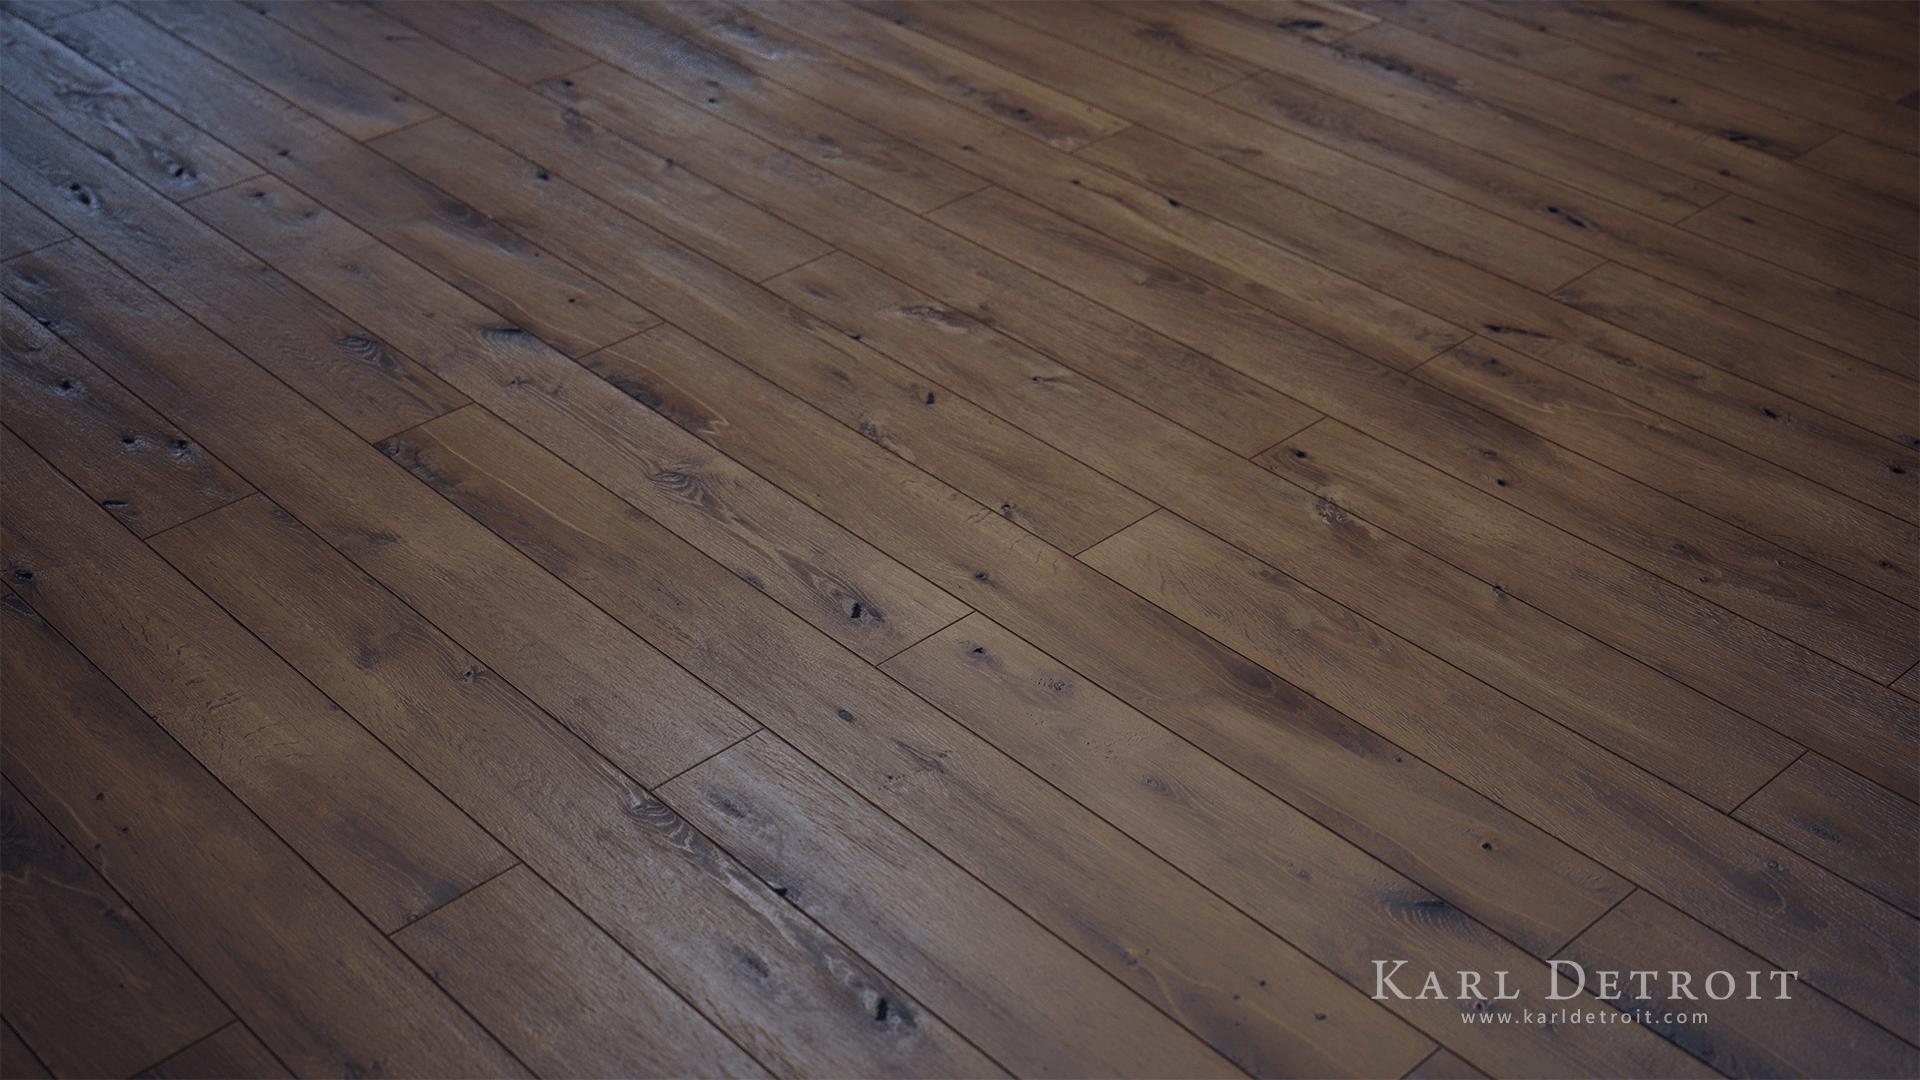 4K Materials Wood Flooring Vol01 by Karl Detroit in Materials